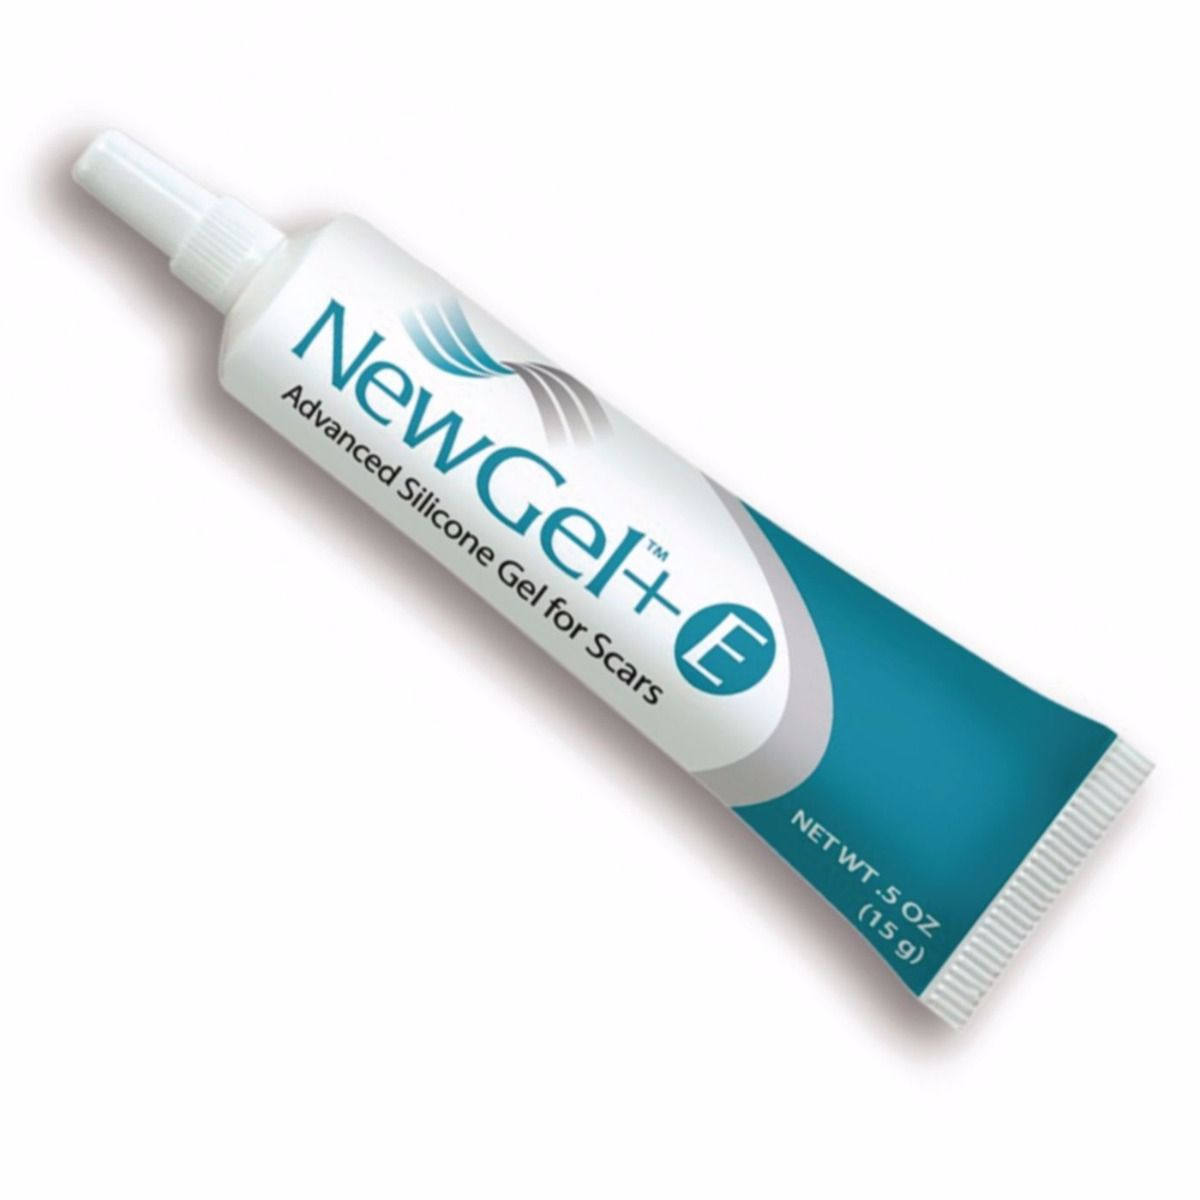 Tube of NewGel ointment